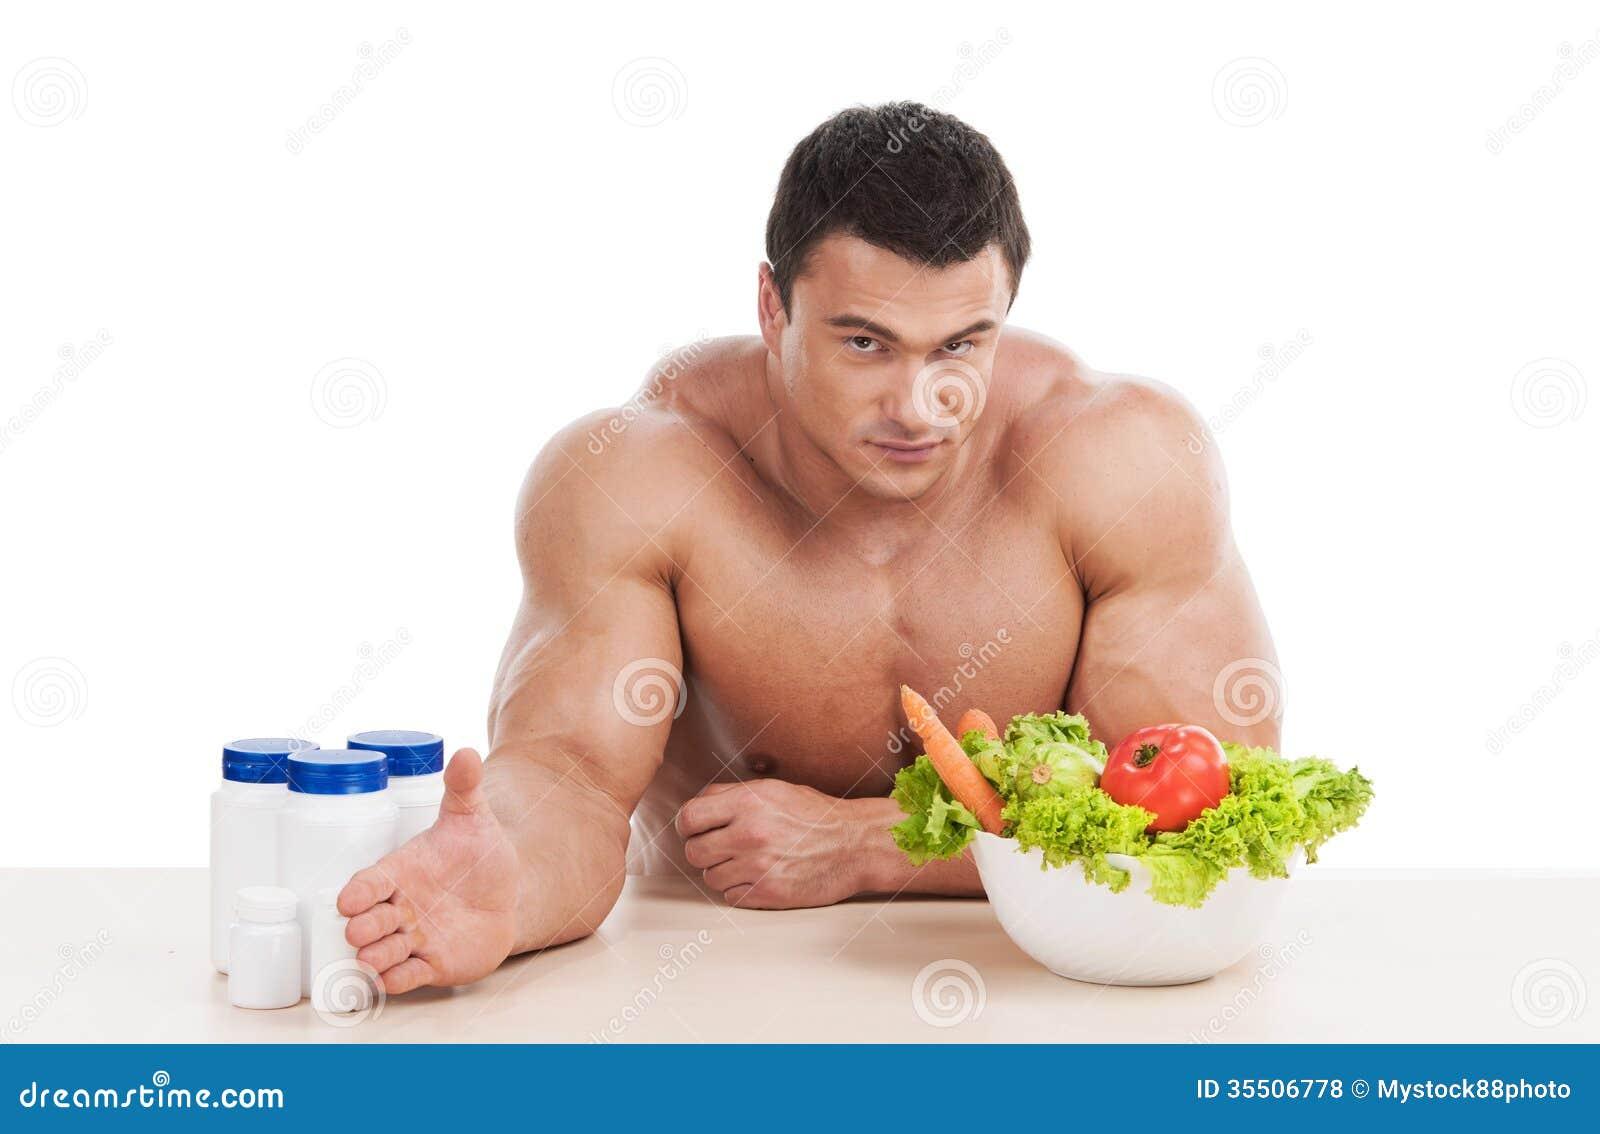 steroid free bodybuilding routine